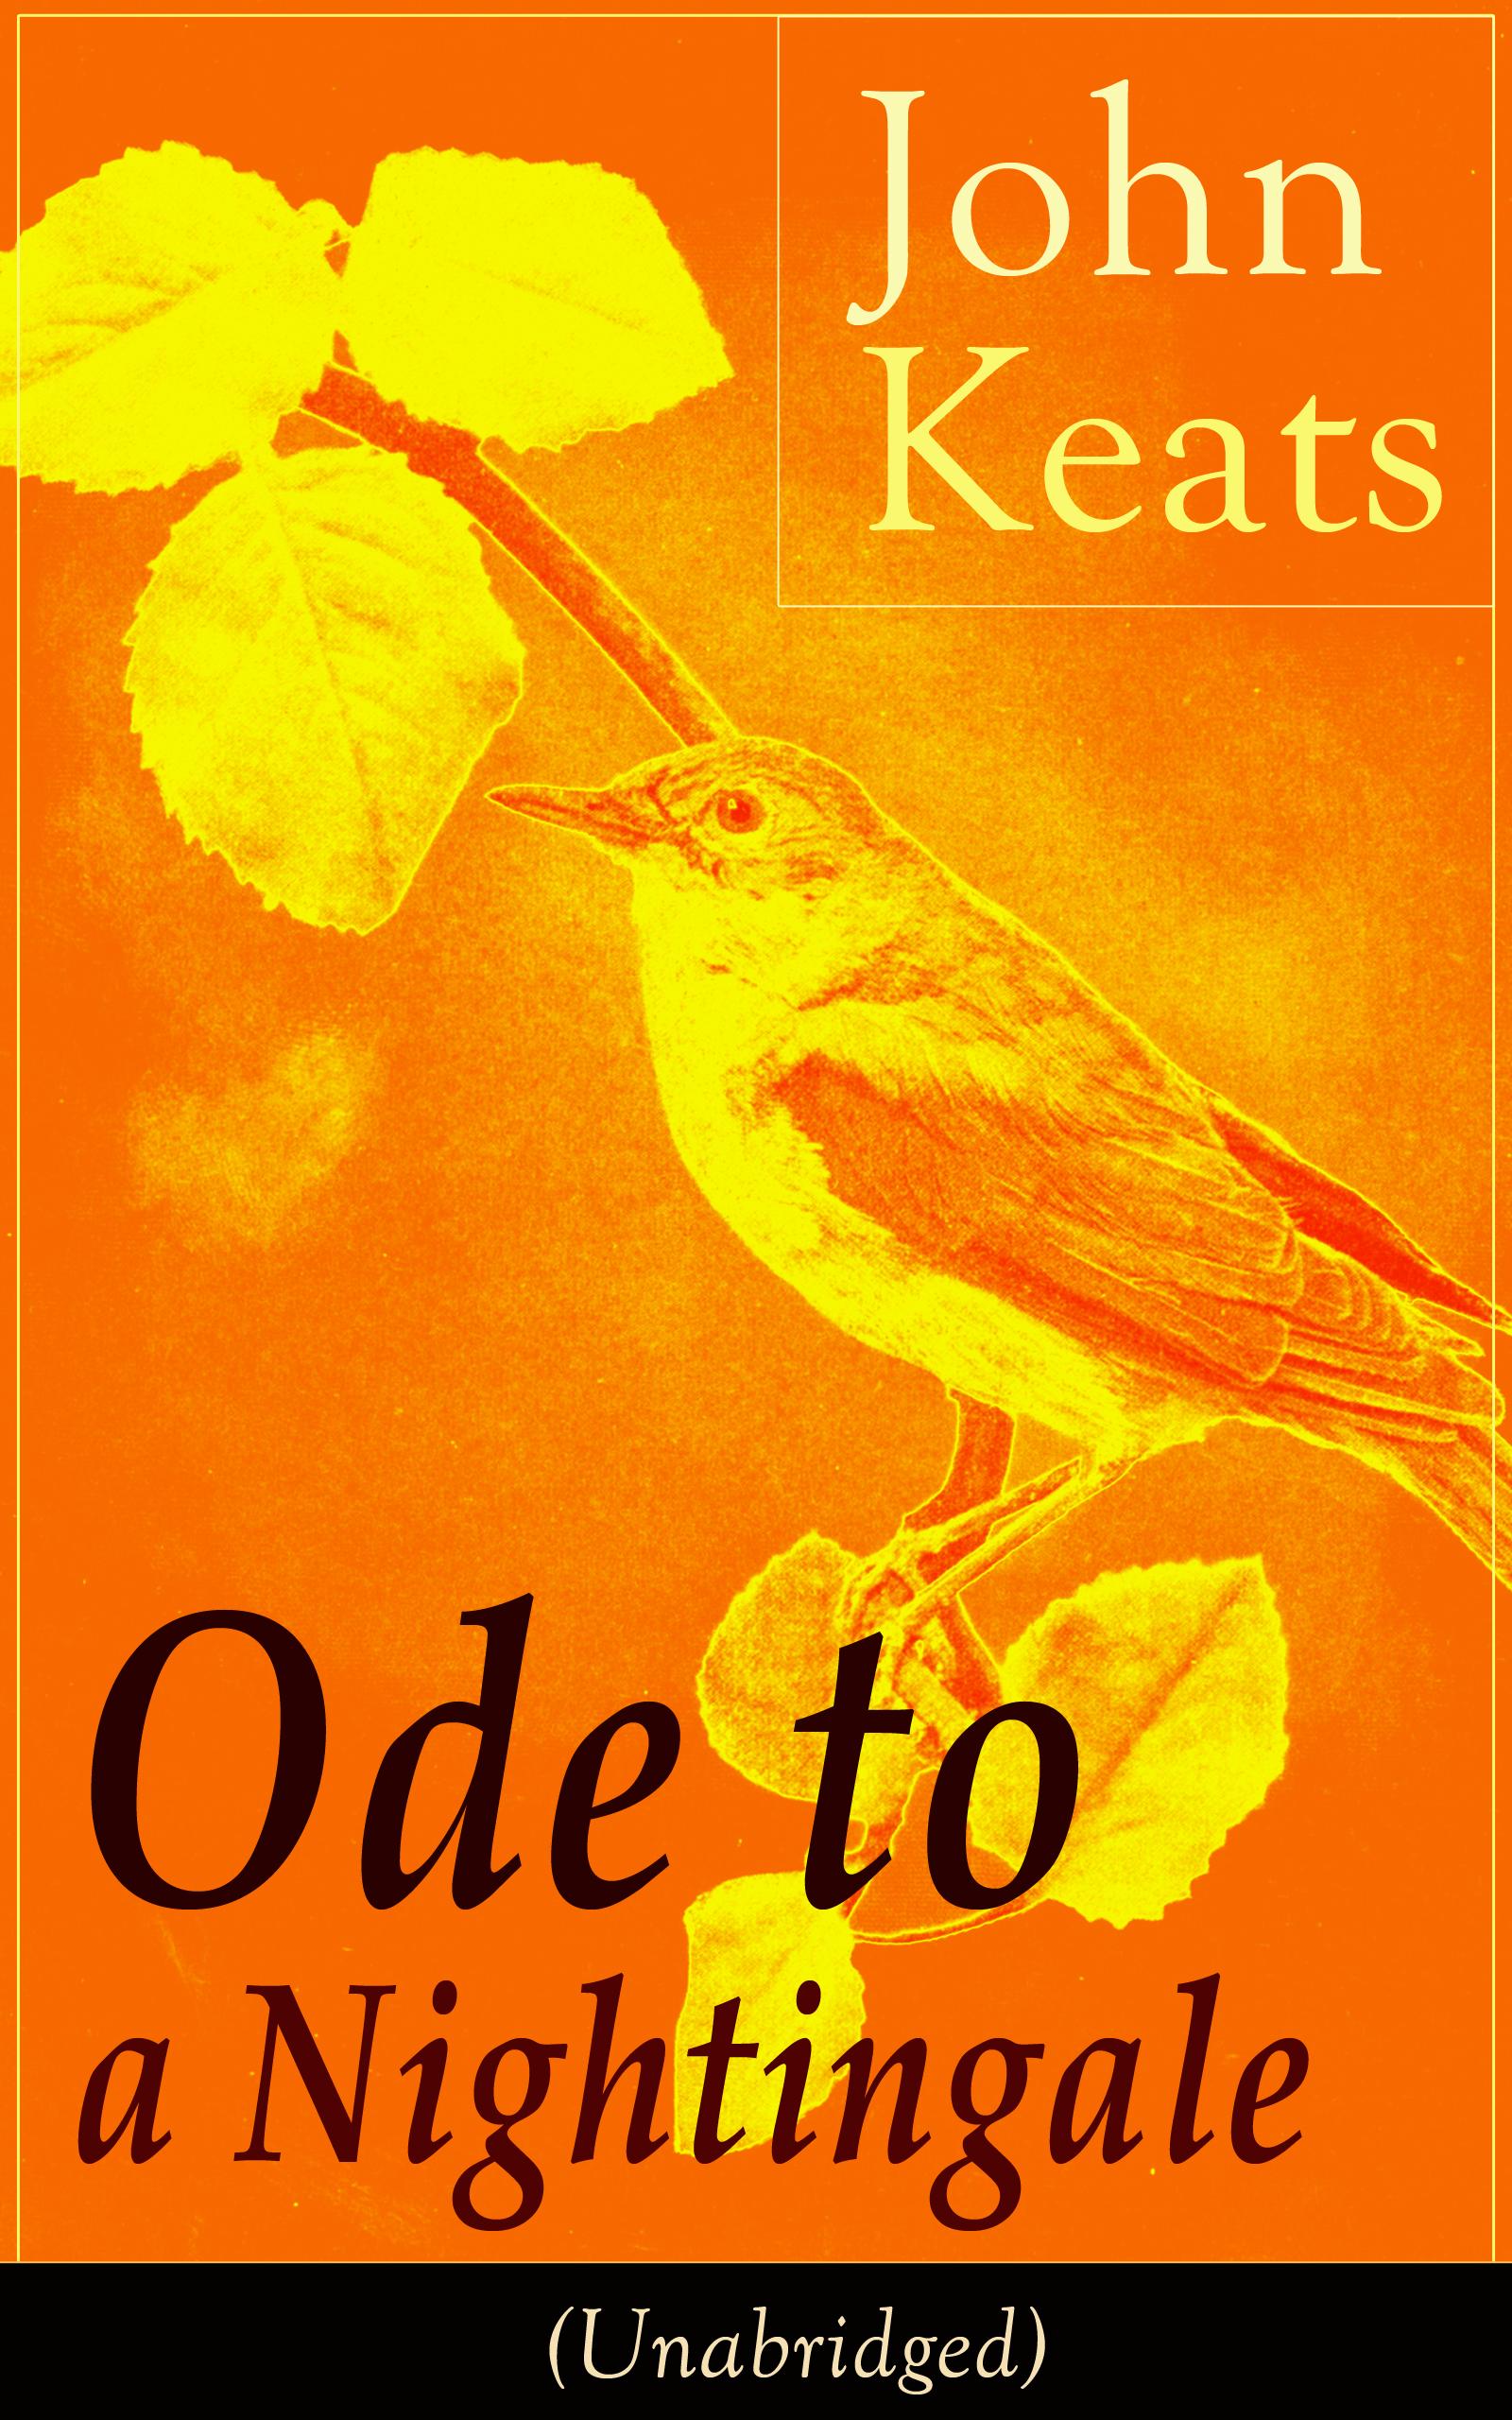 John Keats John Keats: Ode to a Nightingale (Unabridged) john keats